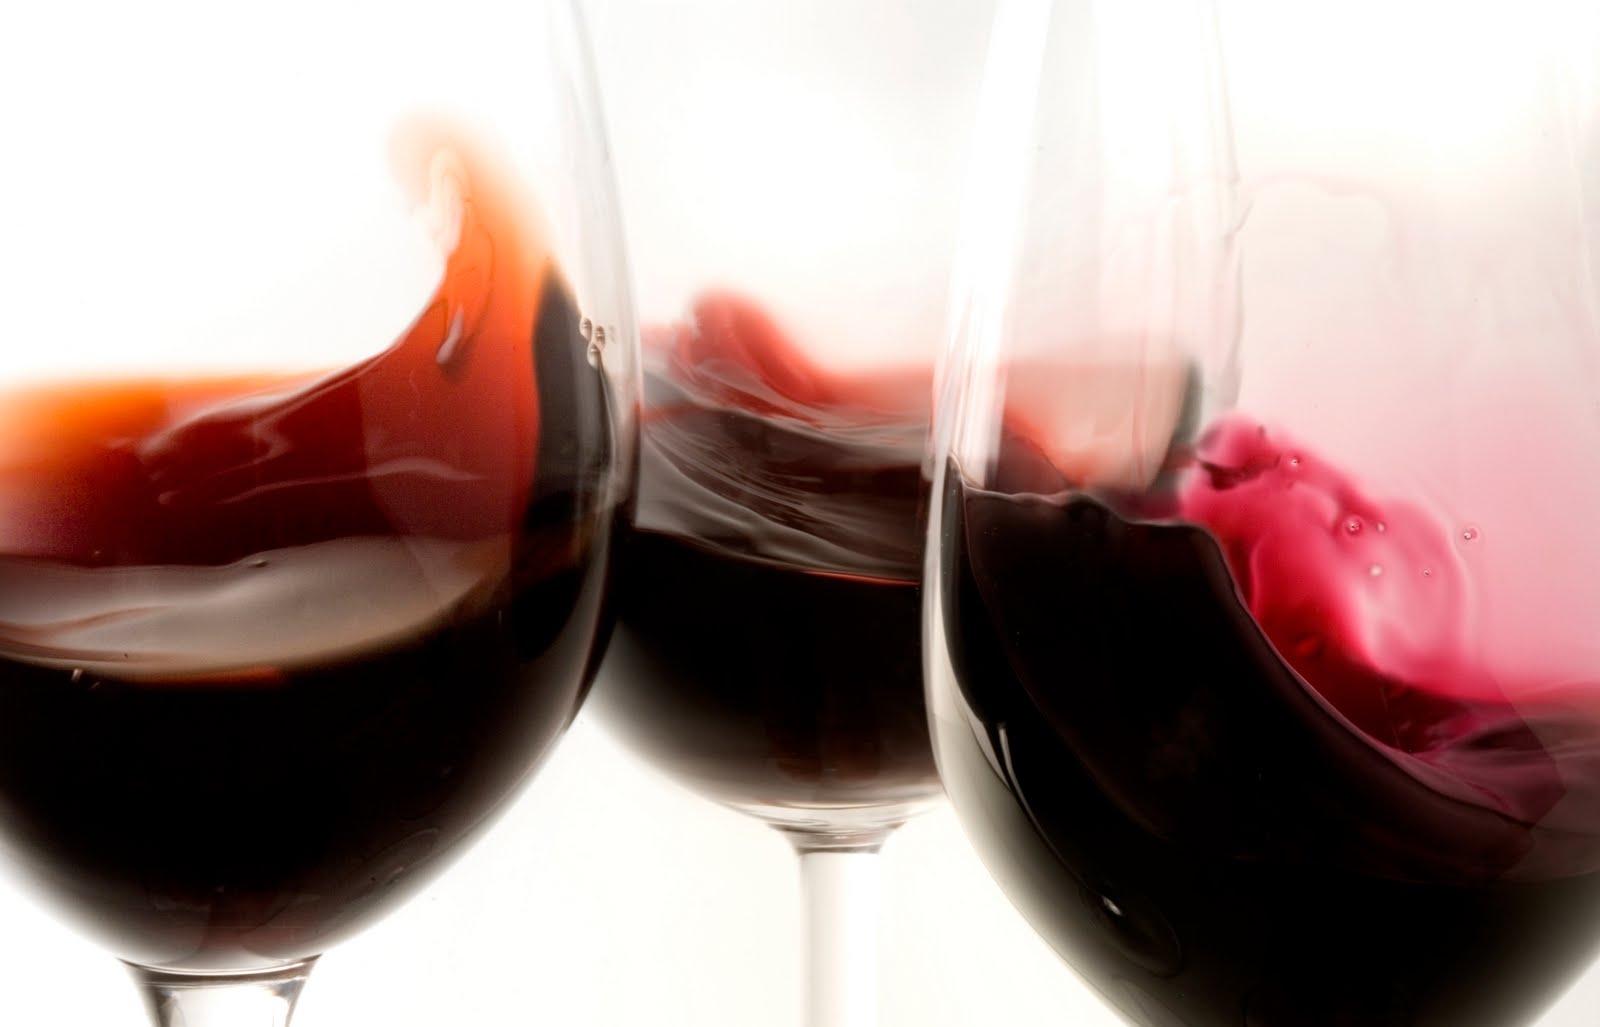 Vino Rosso Agli Americani Piace Sardo Wine Spectator